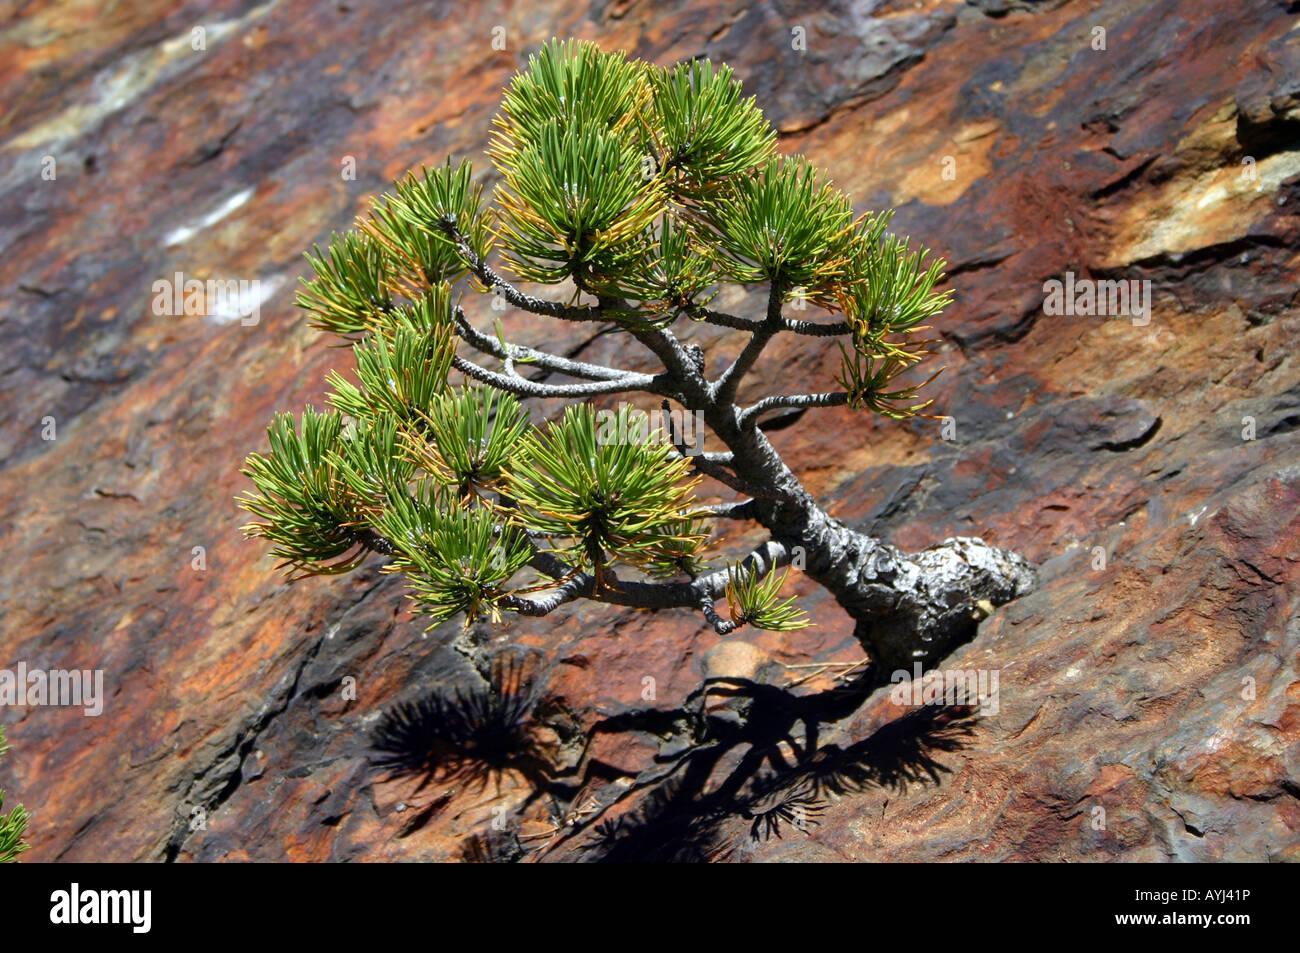 Pine Tree Growing In Solid Rock Wild Bonsai Stock Photo Alamy